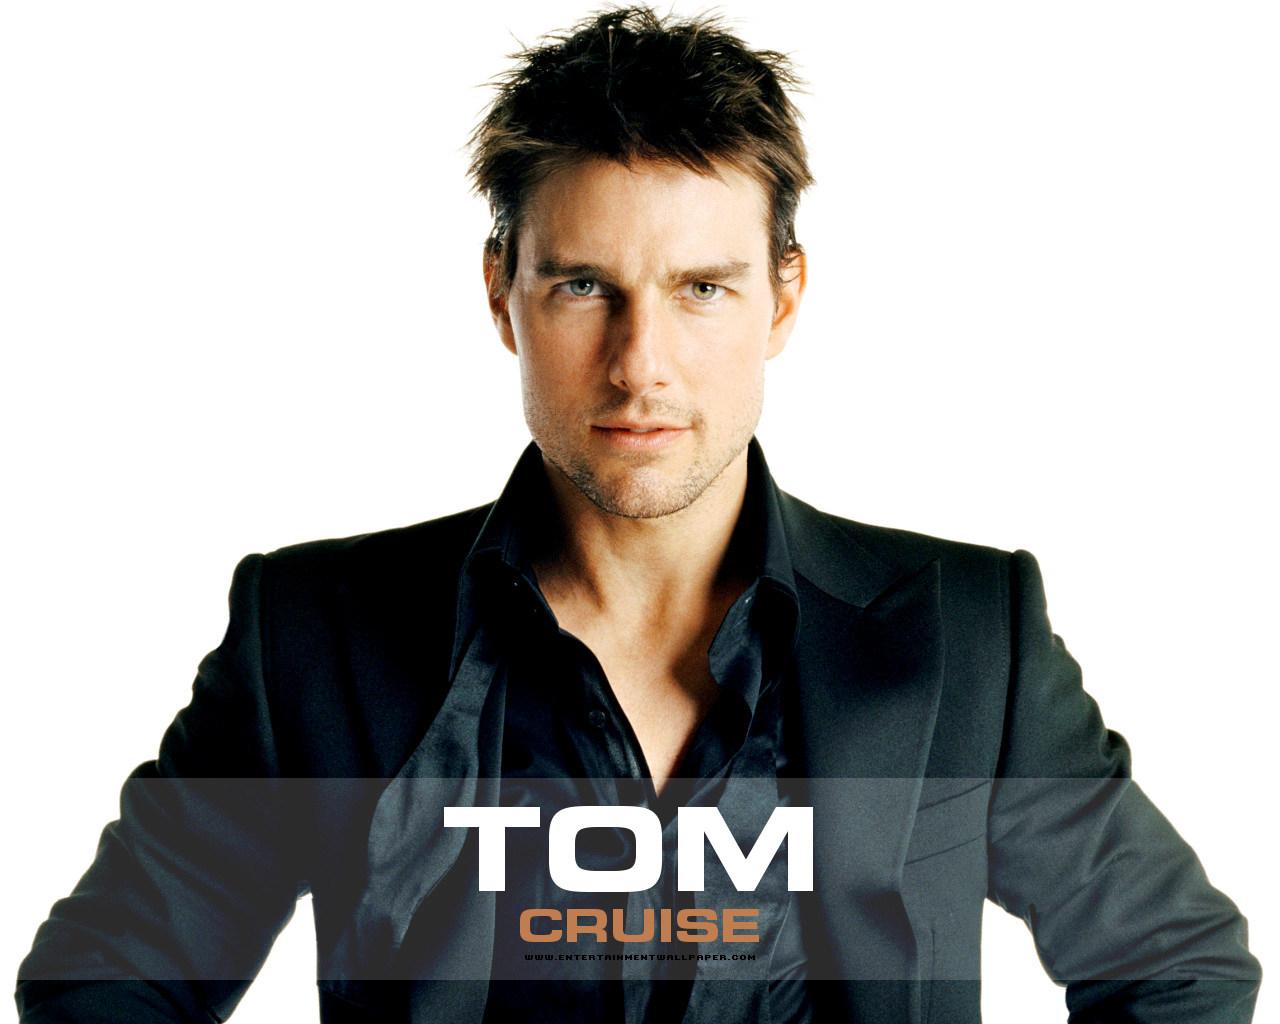 http://2.bp.blogspot.com/-ht4KovwEqTo/T6fpaOsGwEI/AAAAAAAAFU0/APJ-uW2O1P0/s1600/Tom+Cruise+HD+Wallpapers+(14).jpg